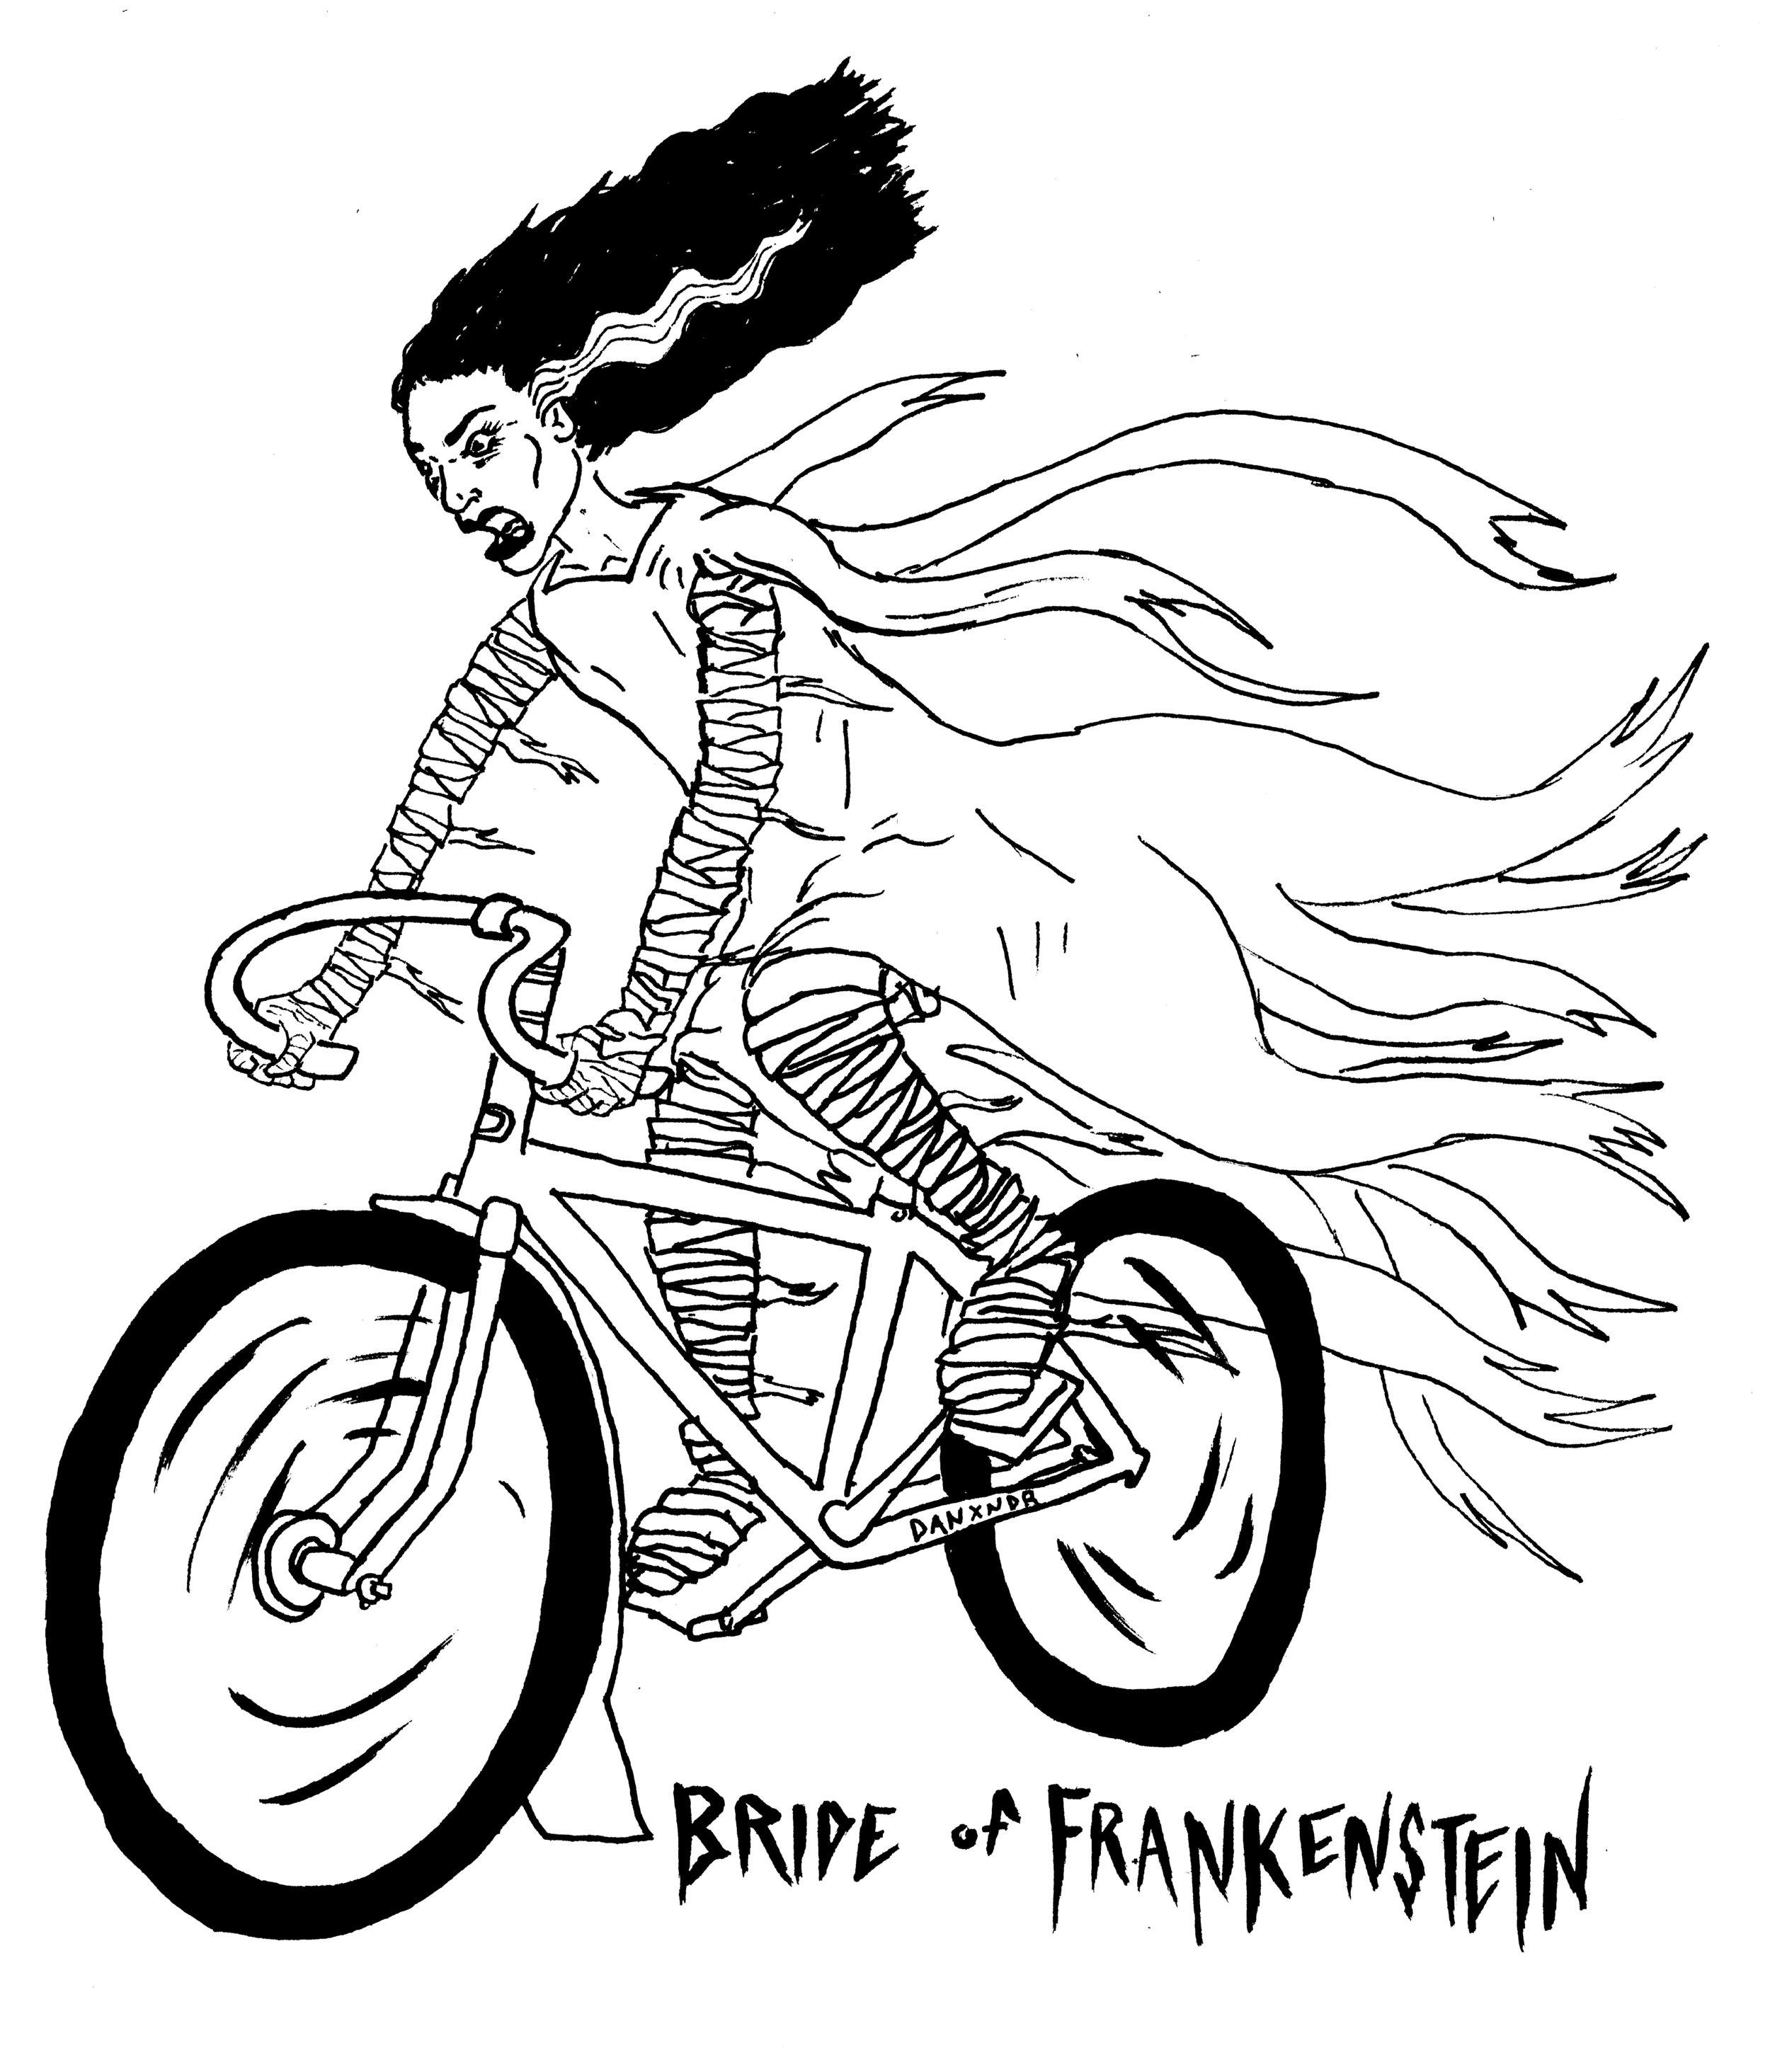 Bride of Frankenstein012.jpg